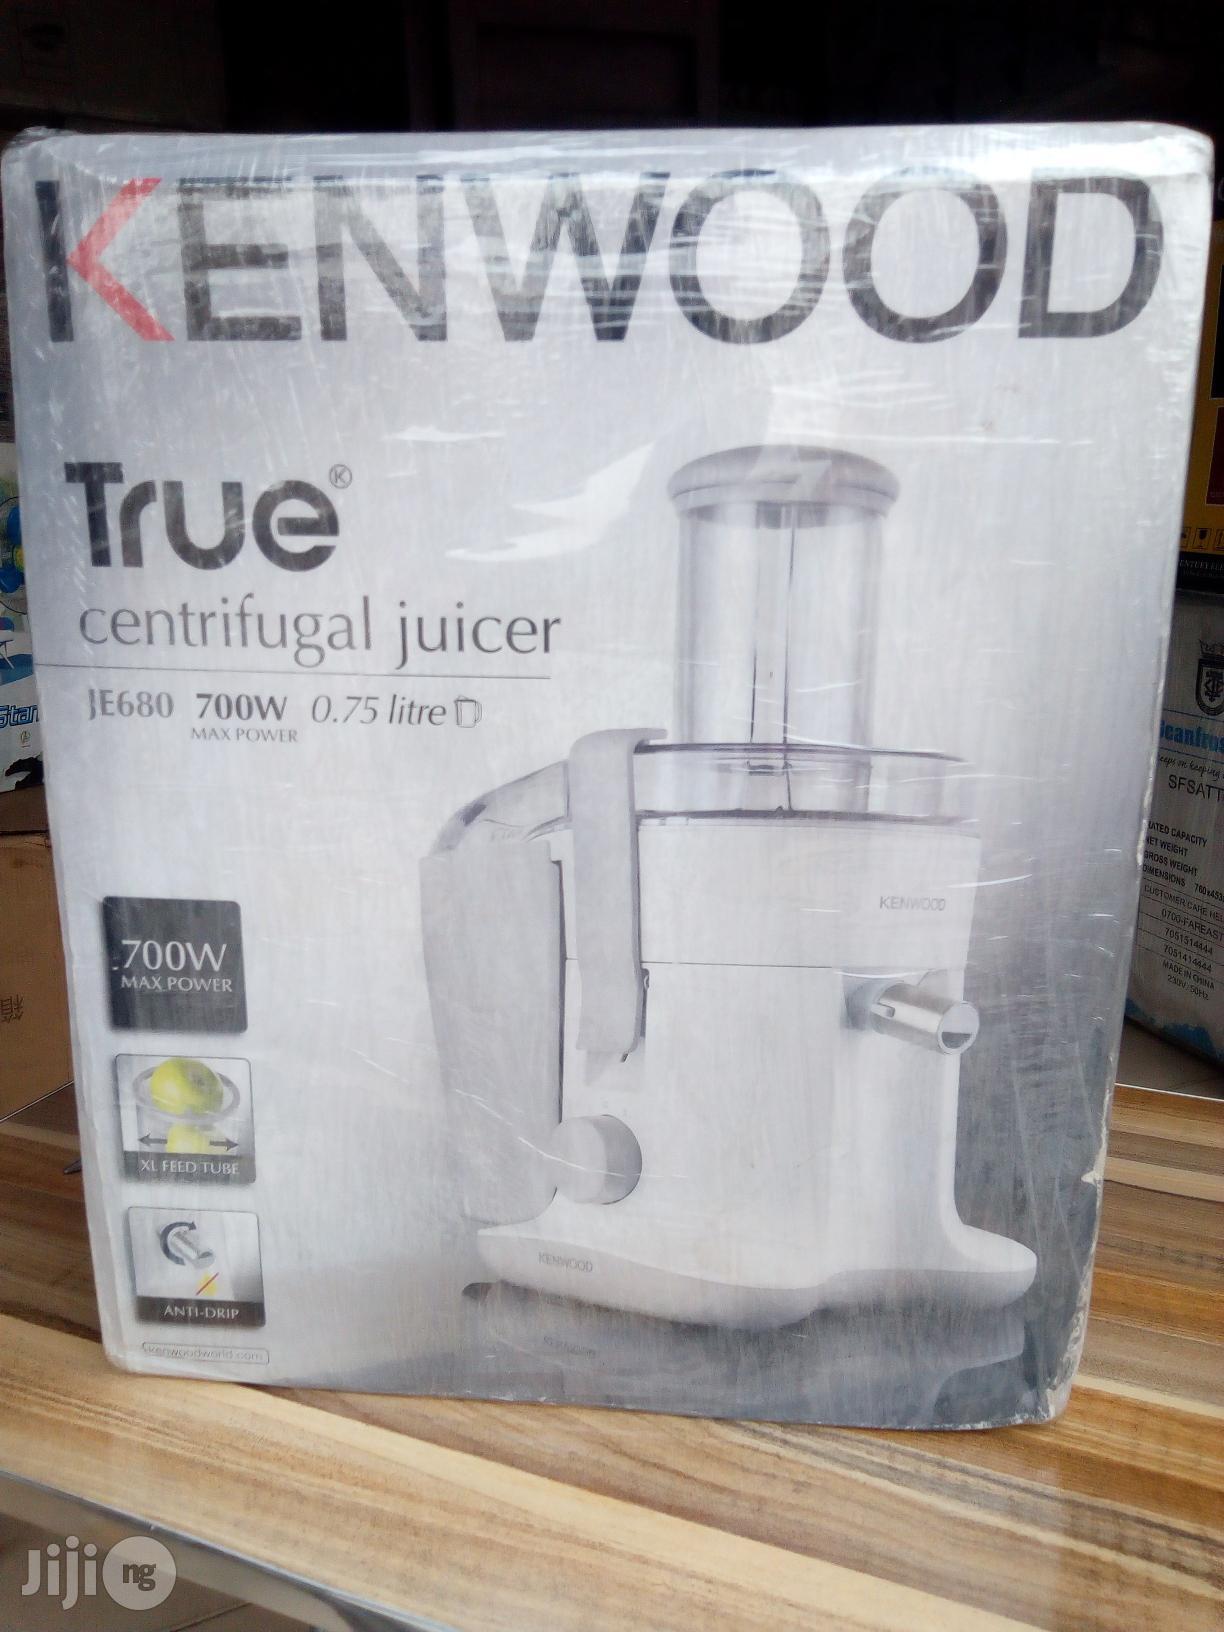 Archive: Kenwood Centrifugal Juicer 700w 0.75litres